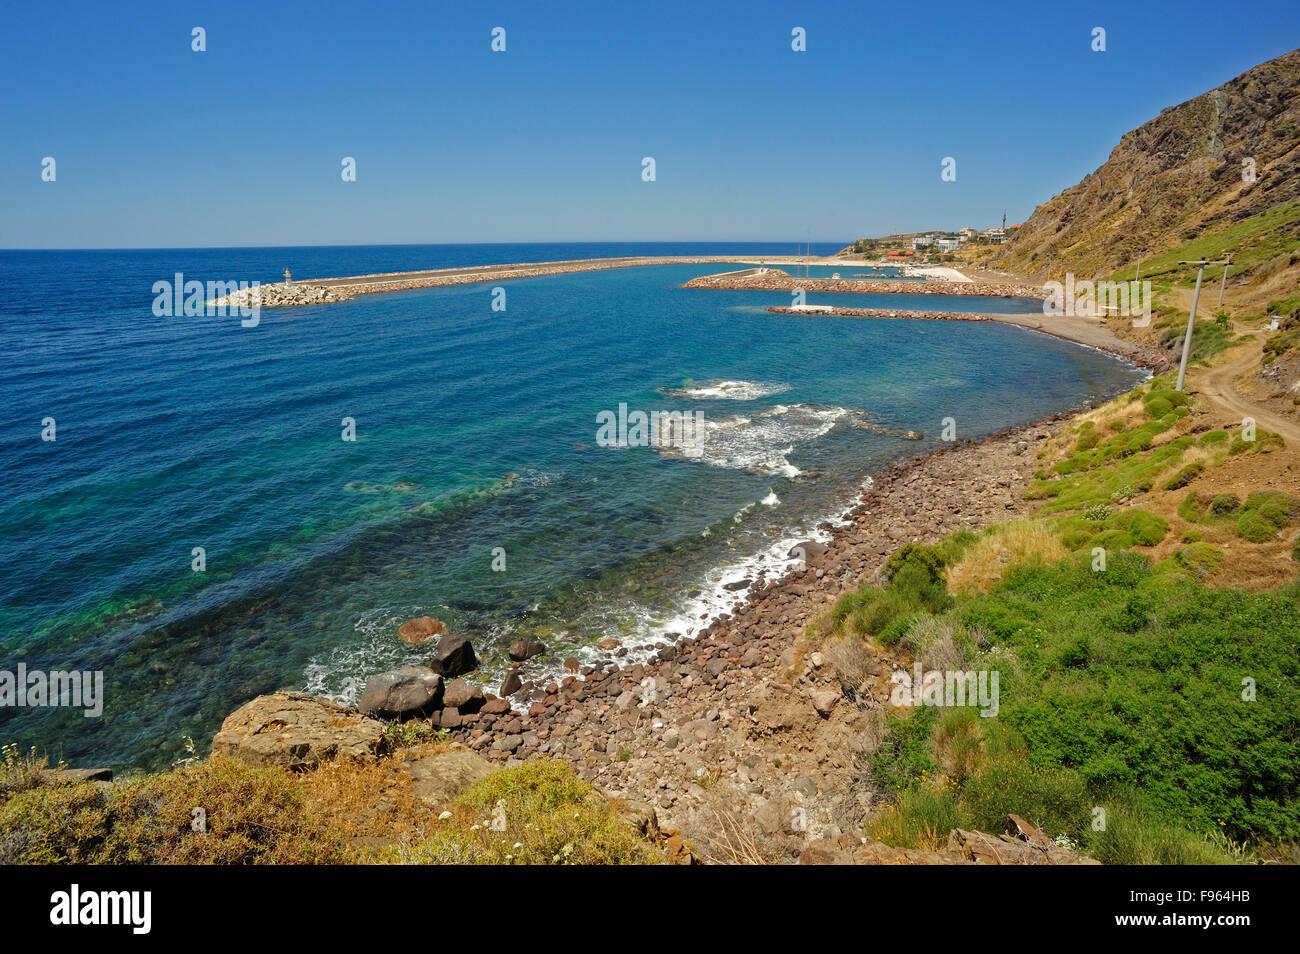 view of breakwaters and harbour, Babakale, Biga Peninsula, Turkey - Stock Image